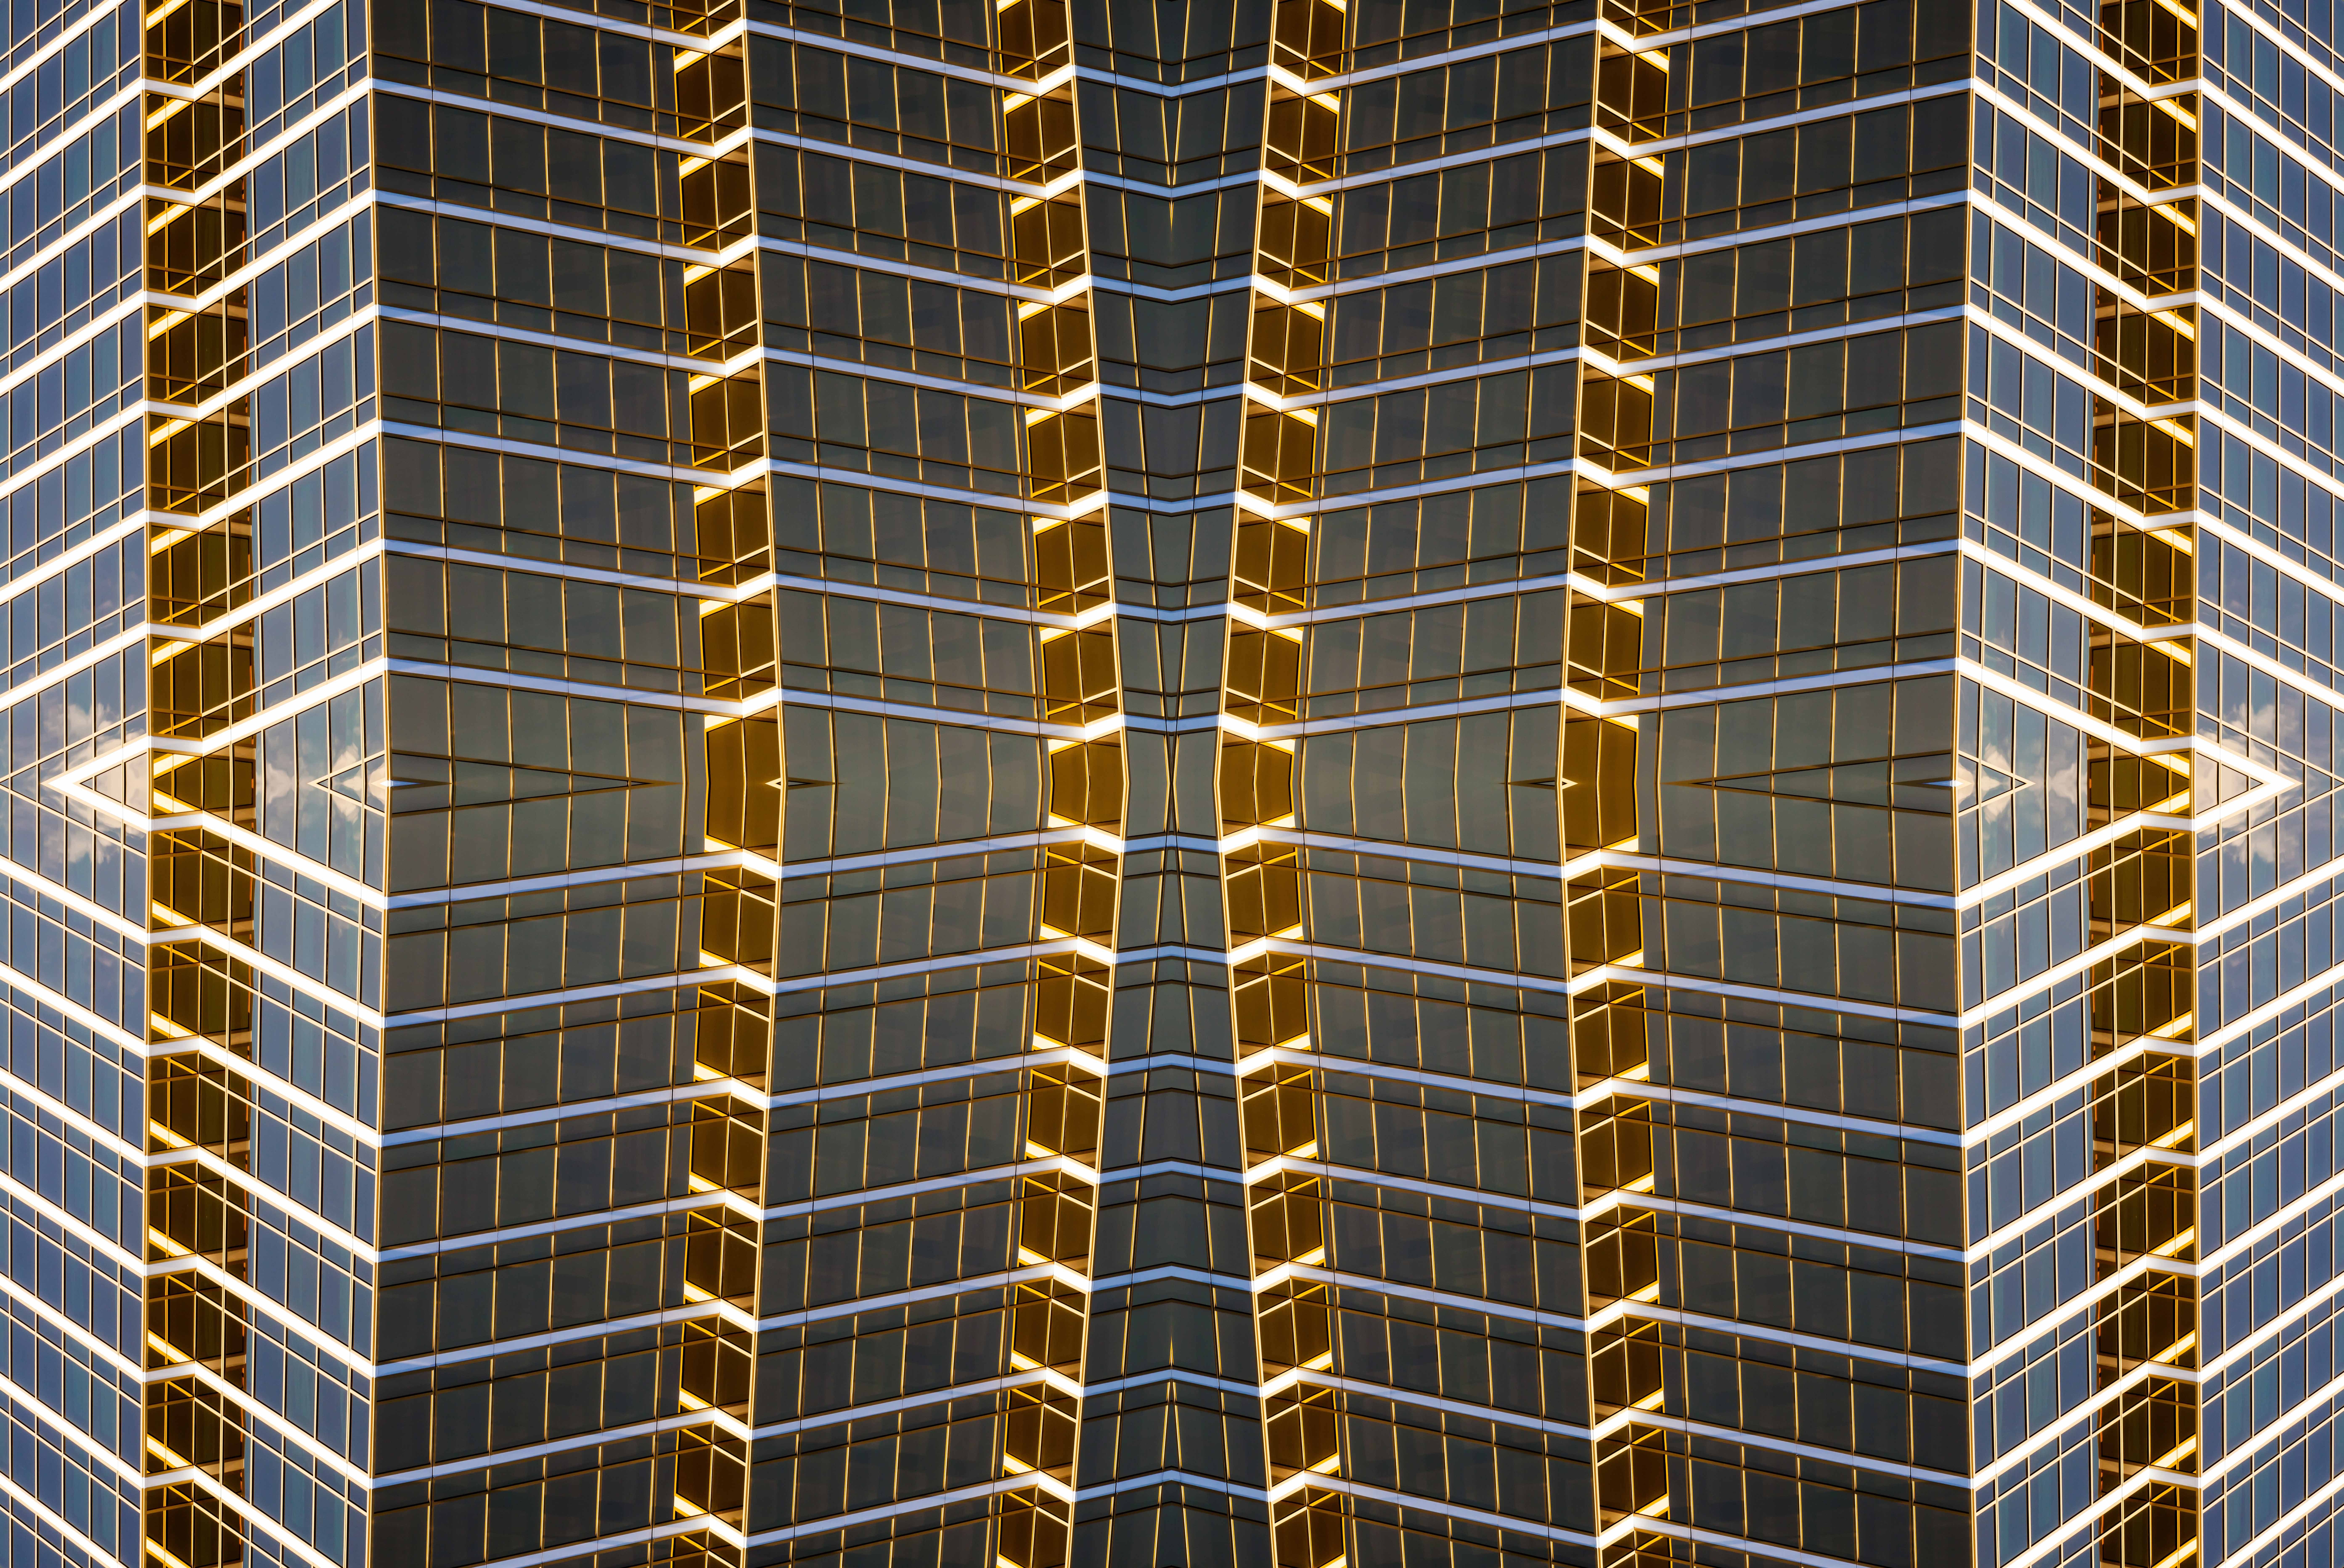 trump tower las vegas wallpaper - photo #8